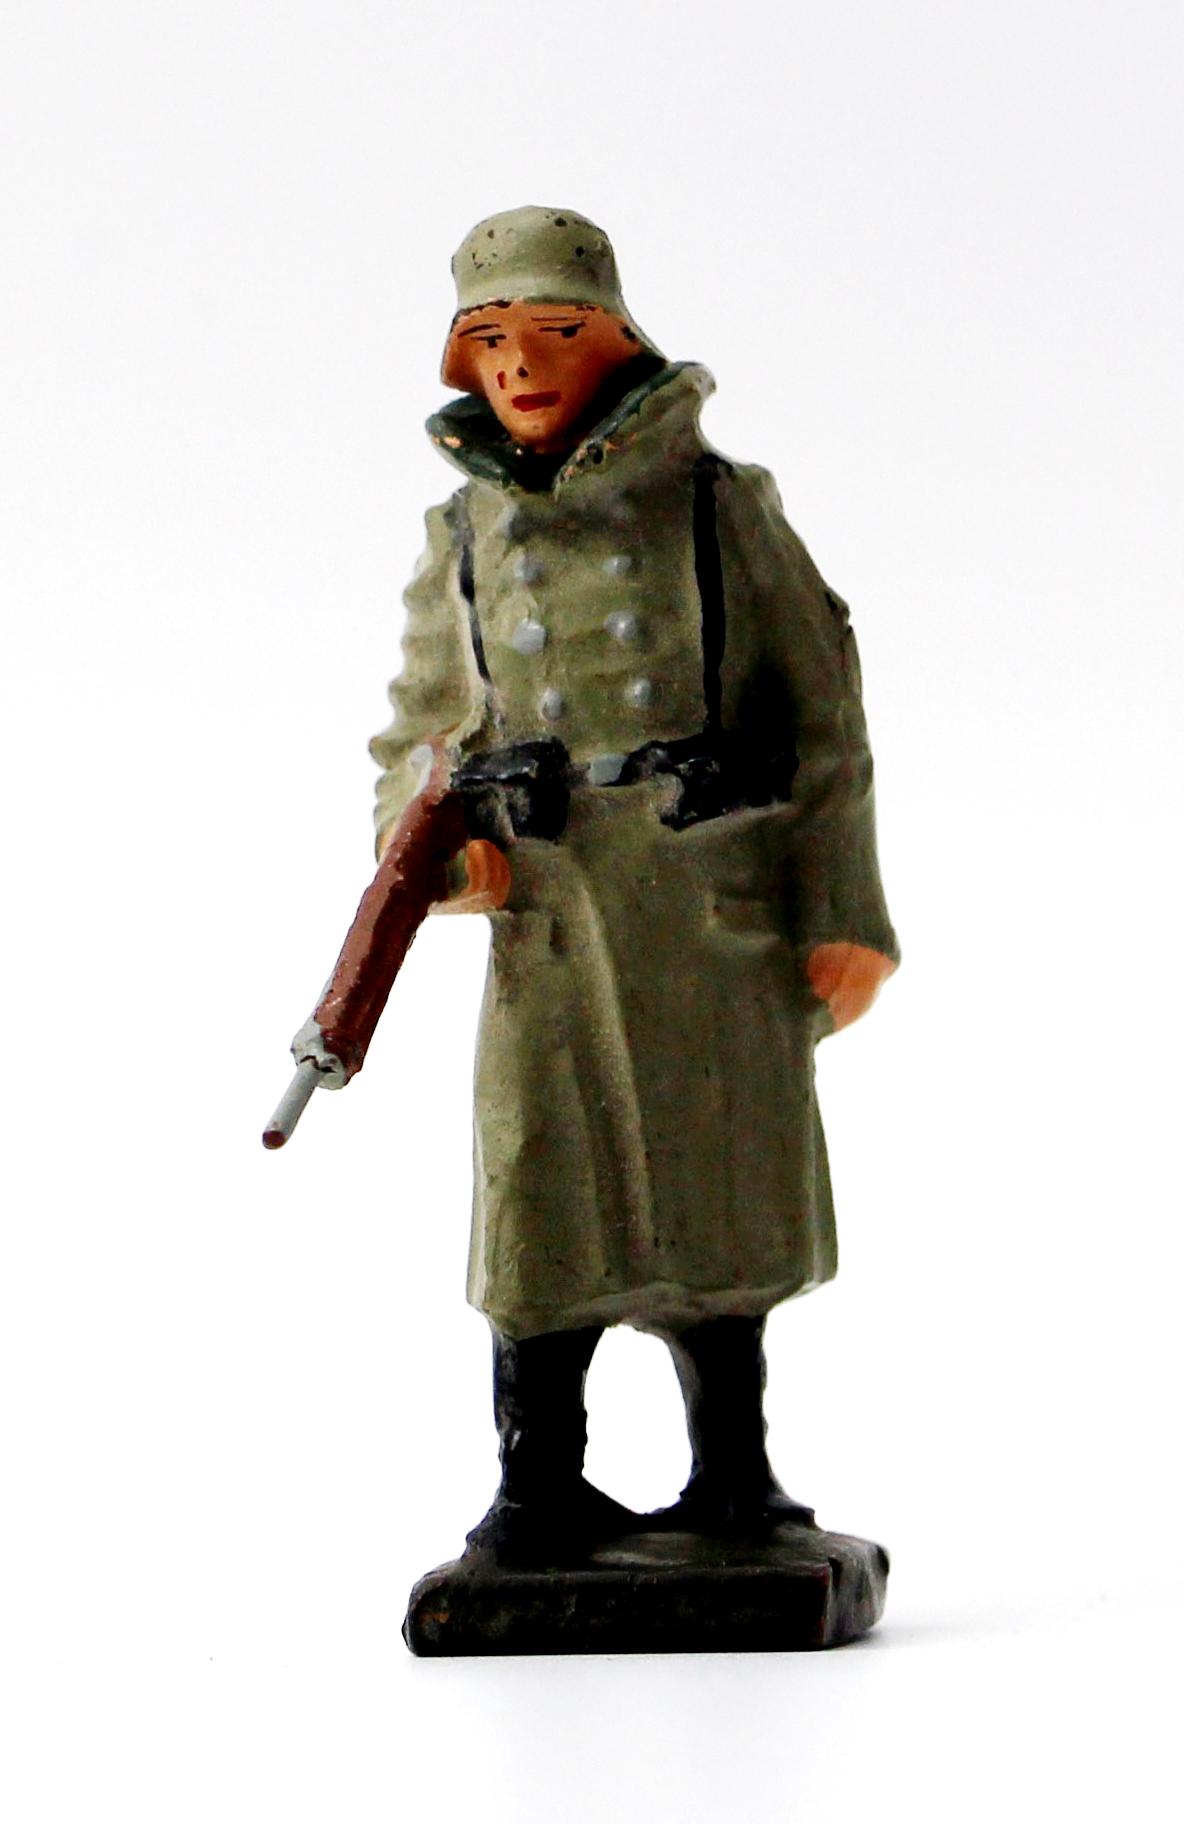 Ancienne Figurine en composition - Elastolin - Wehrmacht - Uniforme - Soldat - Guerre 39/45